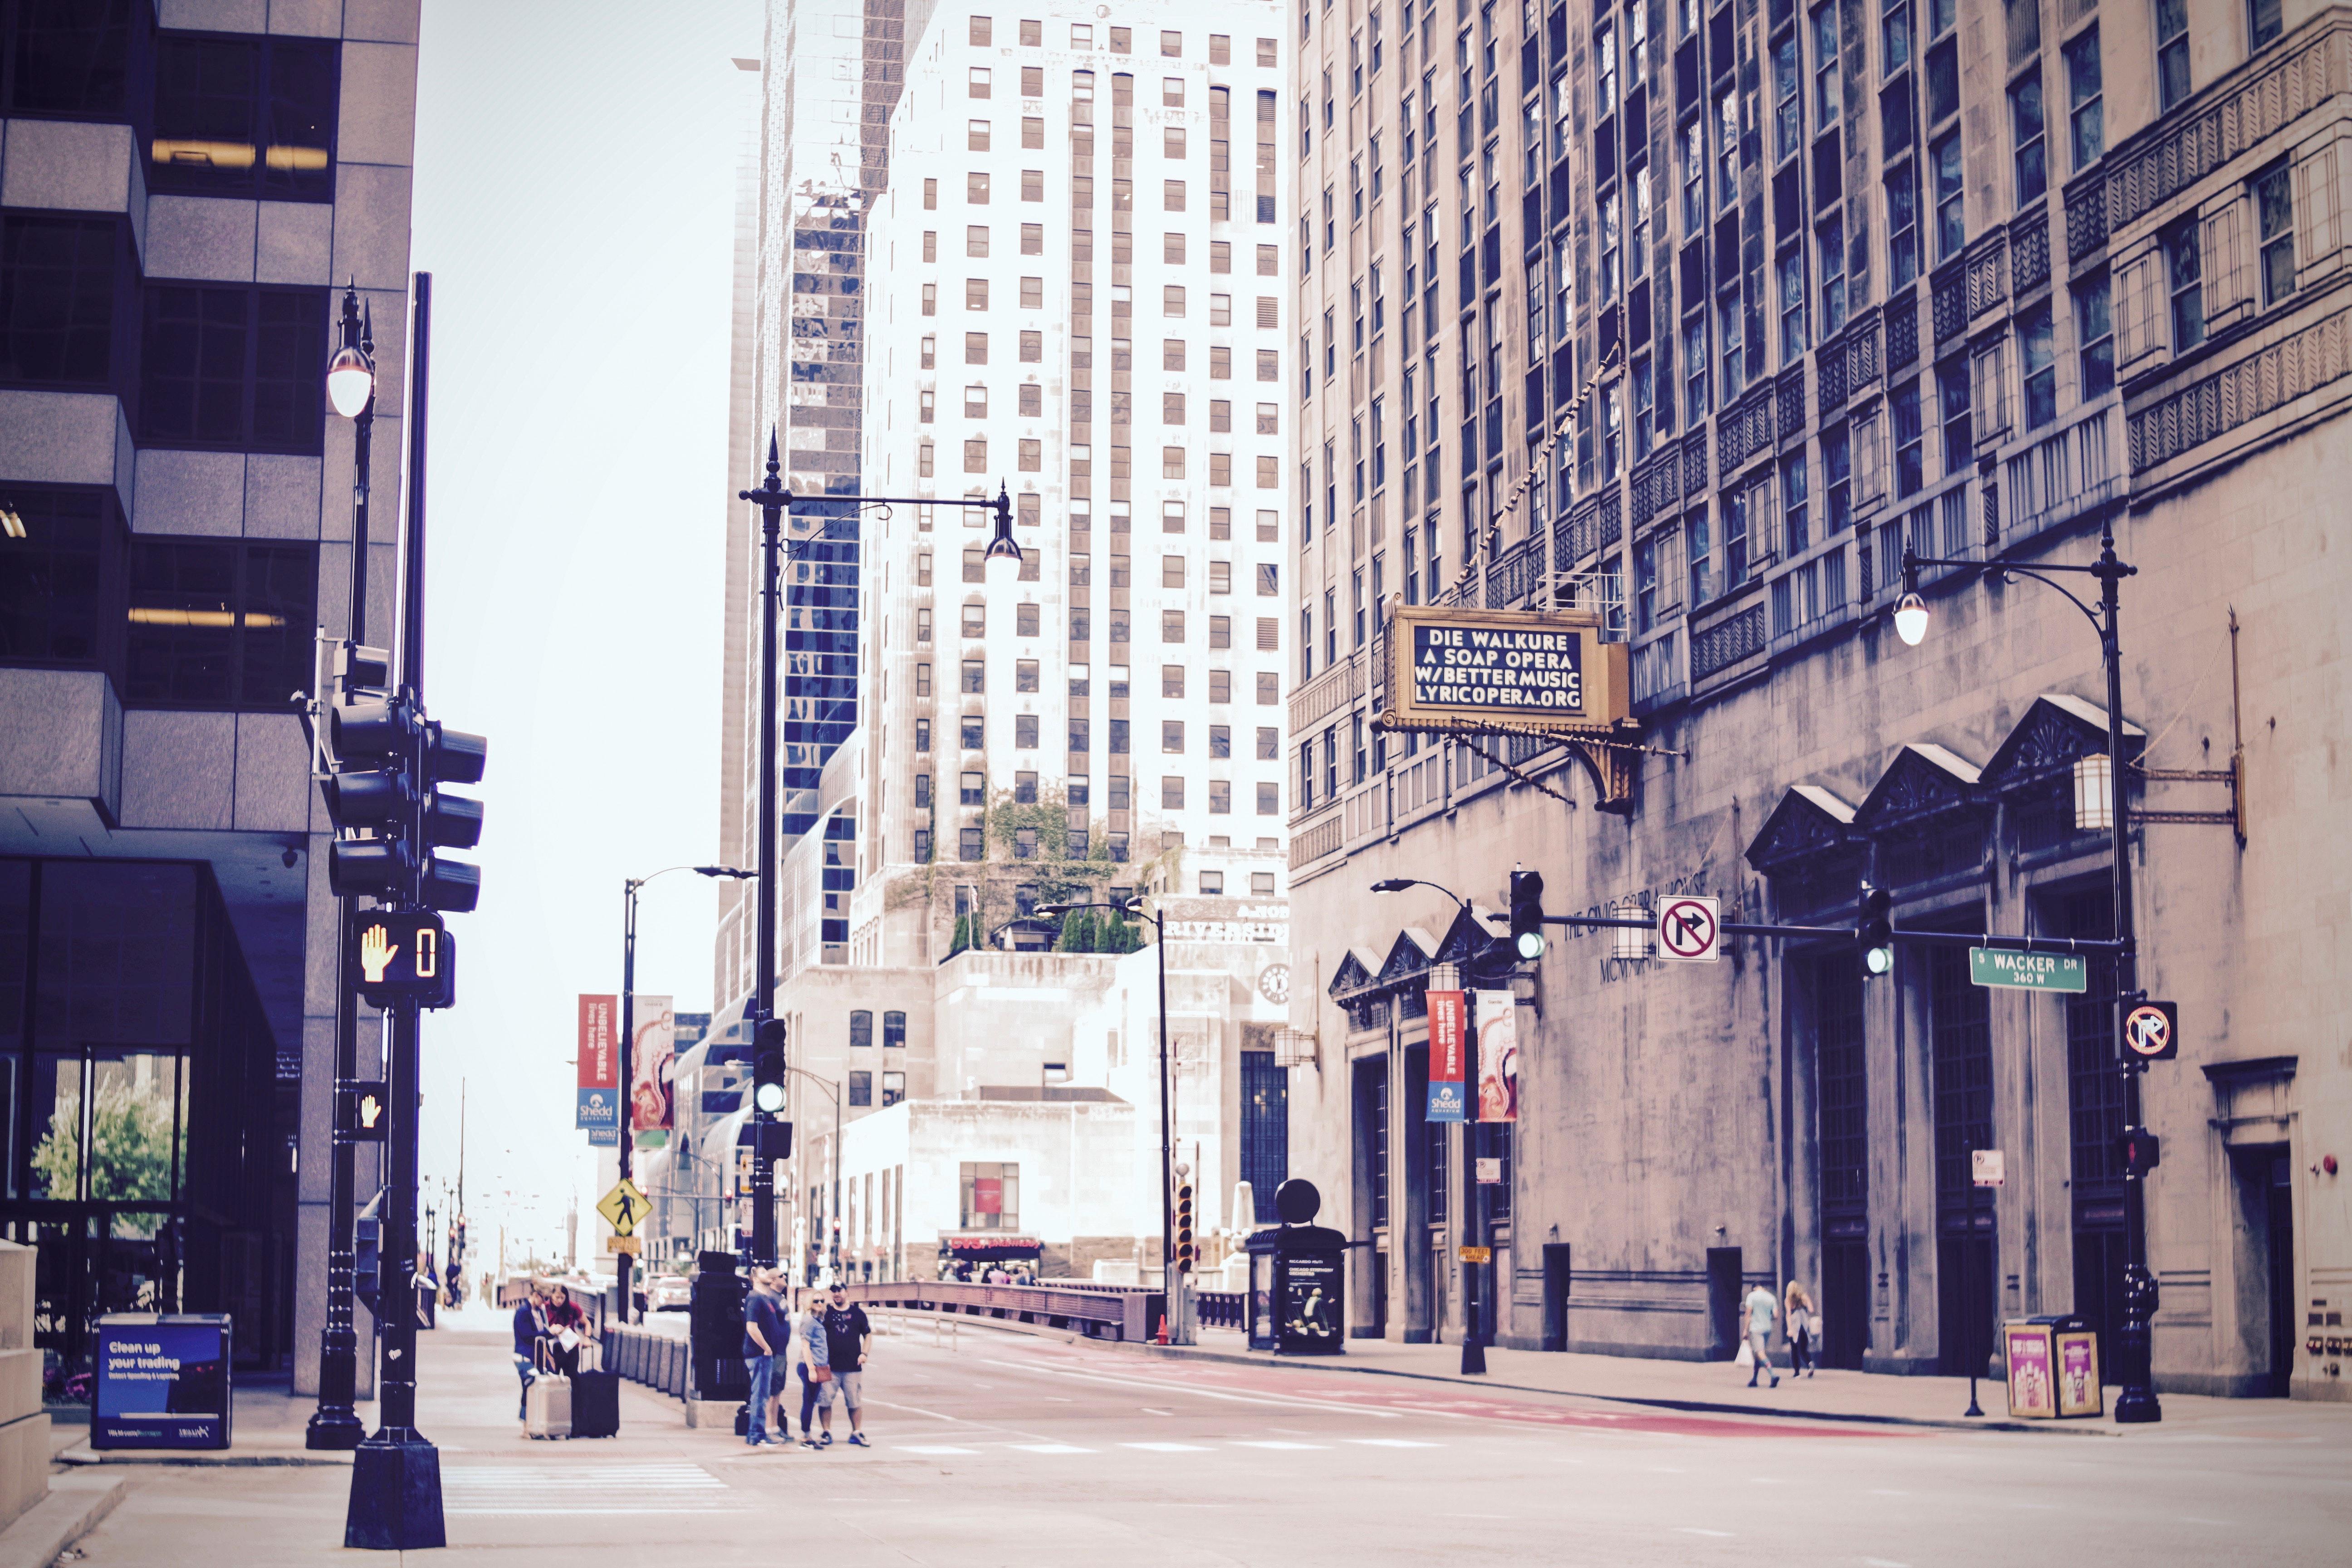 Street Photo, Pavement, Urban, Travel, Town, HQ Photo